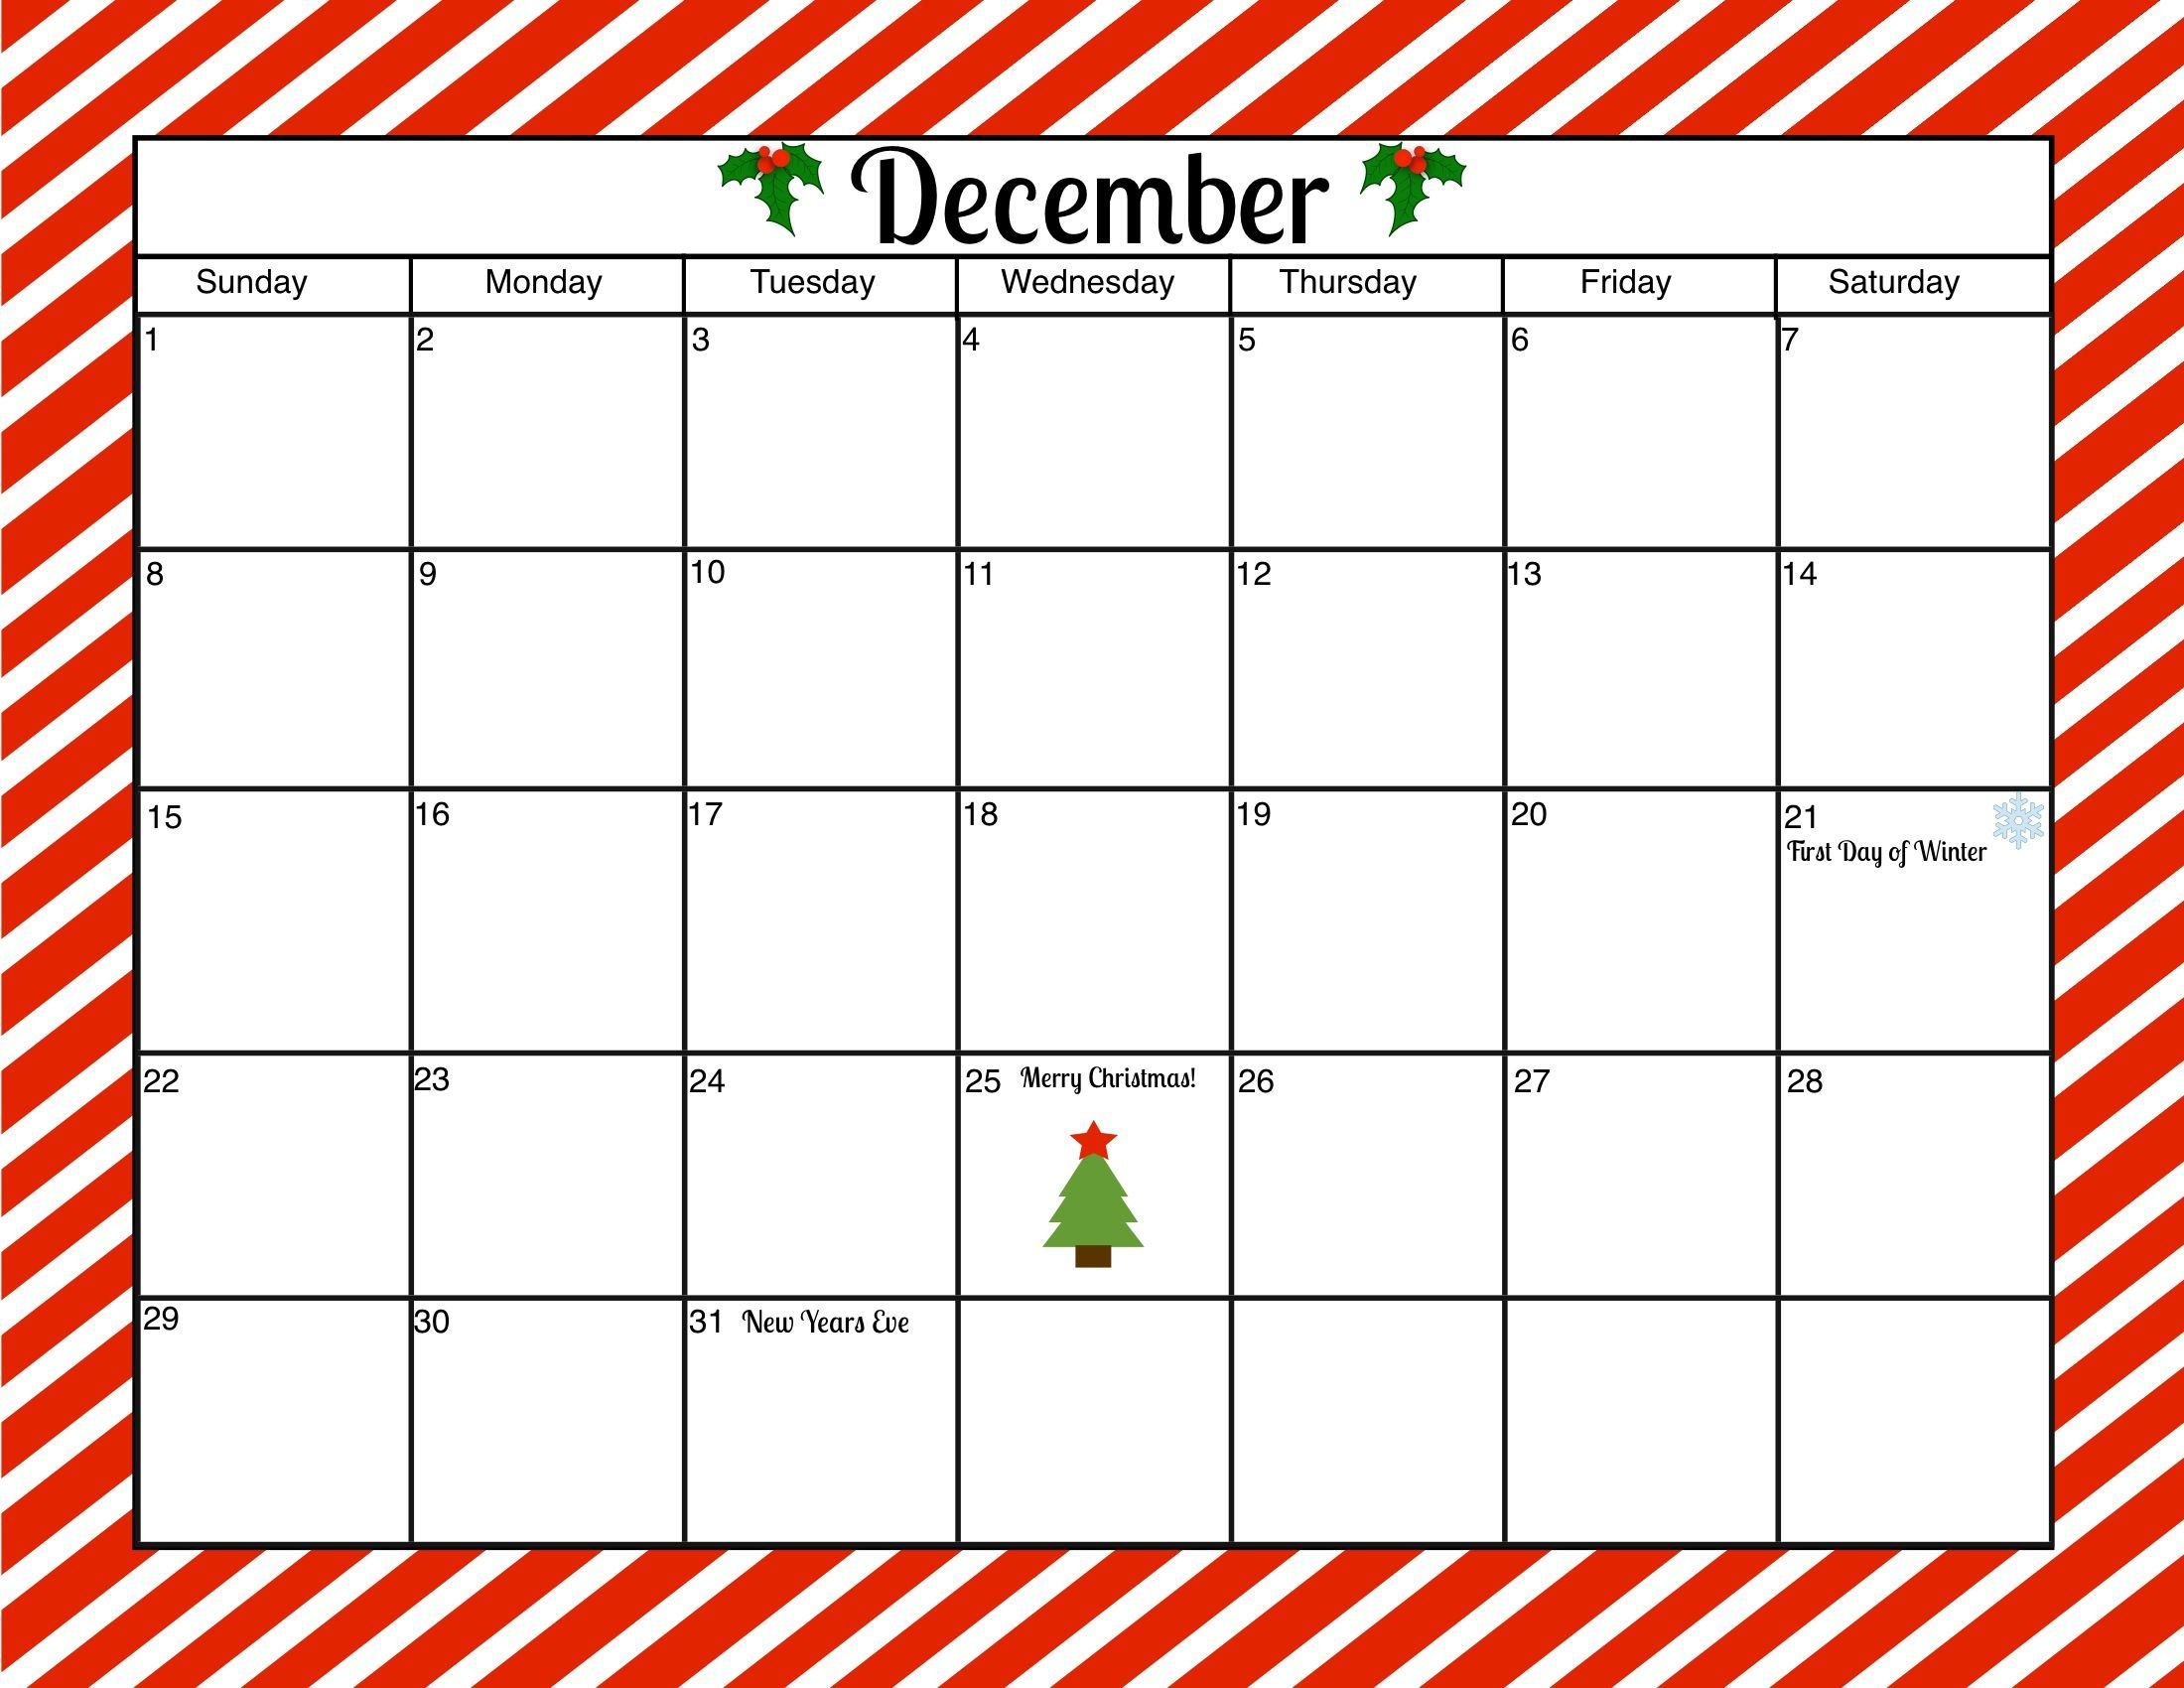 December 2013 Calendar Printable Large December Free Printable